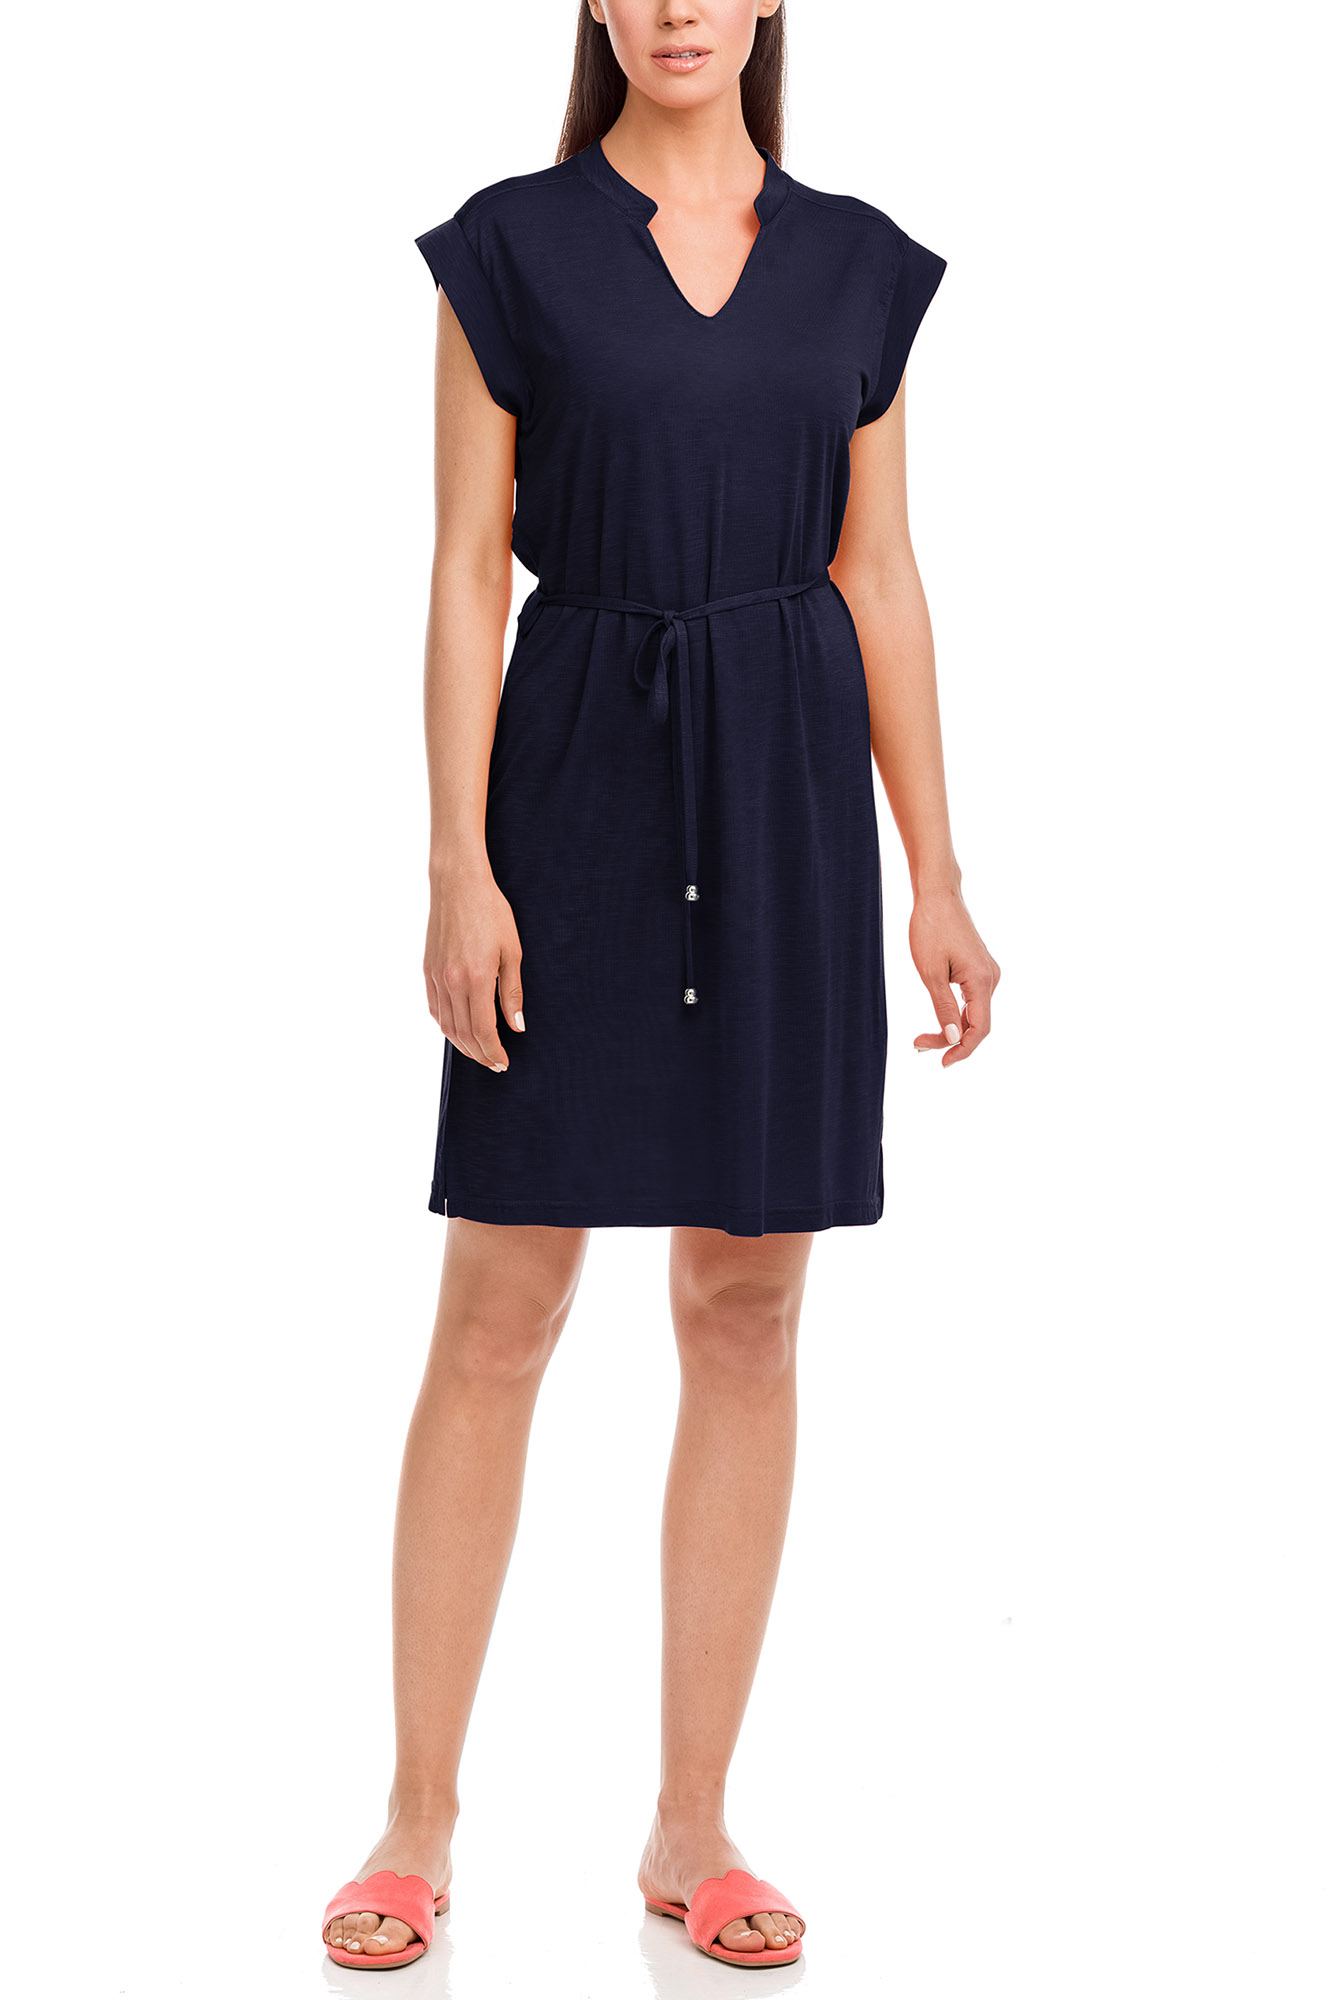 Vamp - Dámske šaty 12590 - Vamp Modrá xl